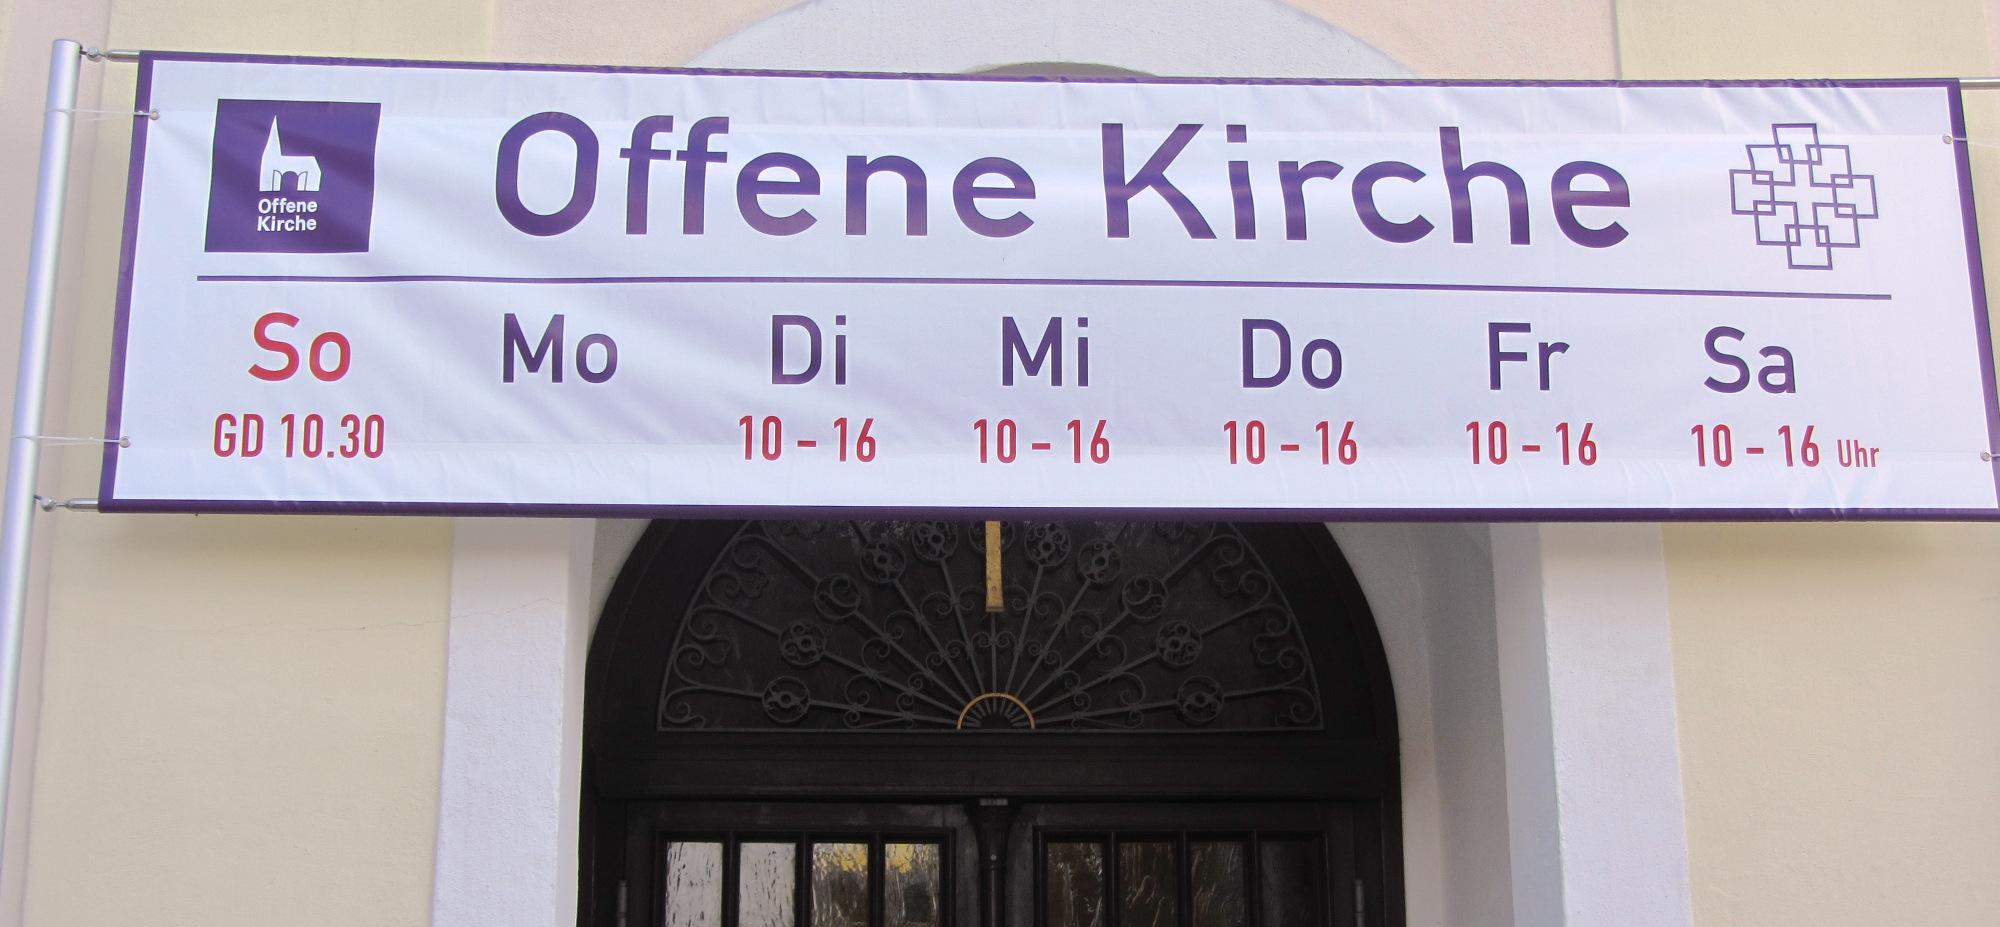 Fantastisch Verkabelte Kirche 2016 Ideen - Elektrische Schaltplan ...